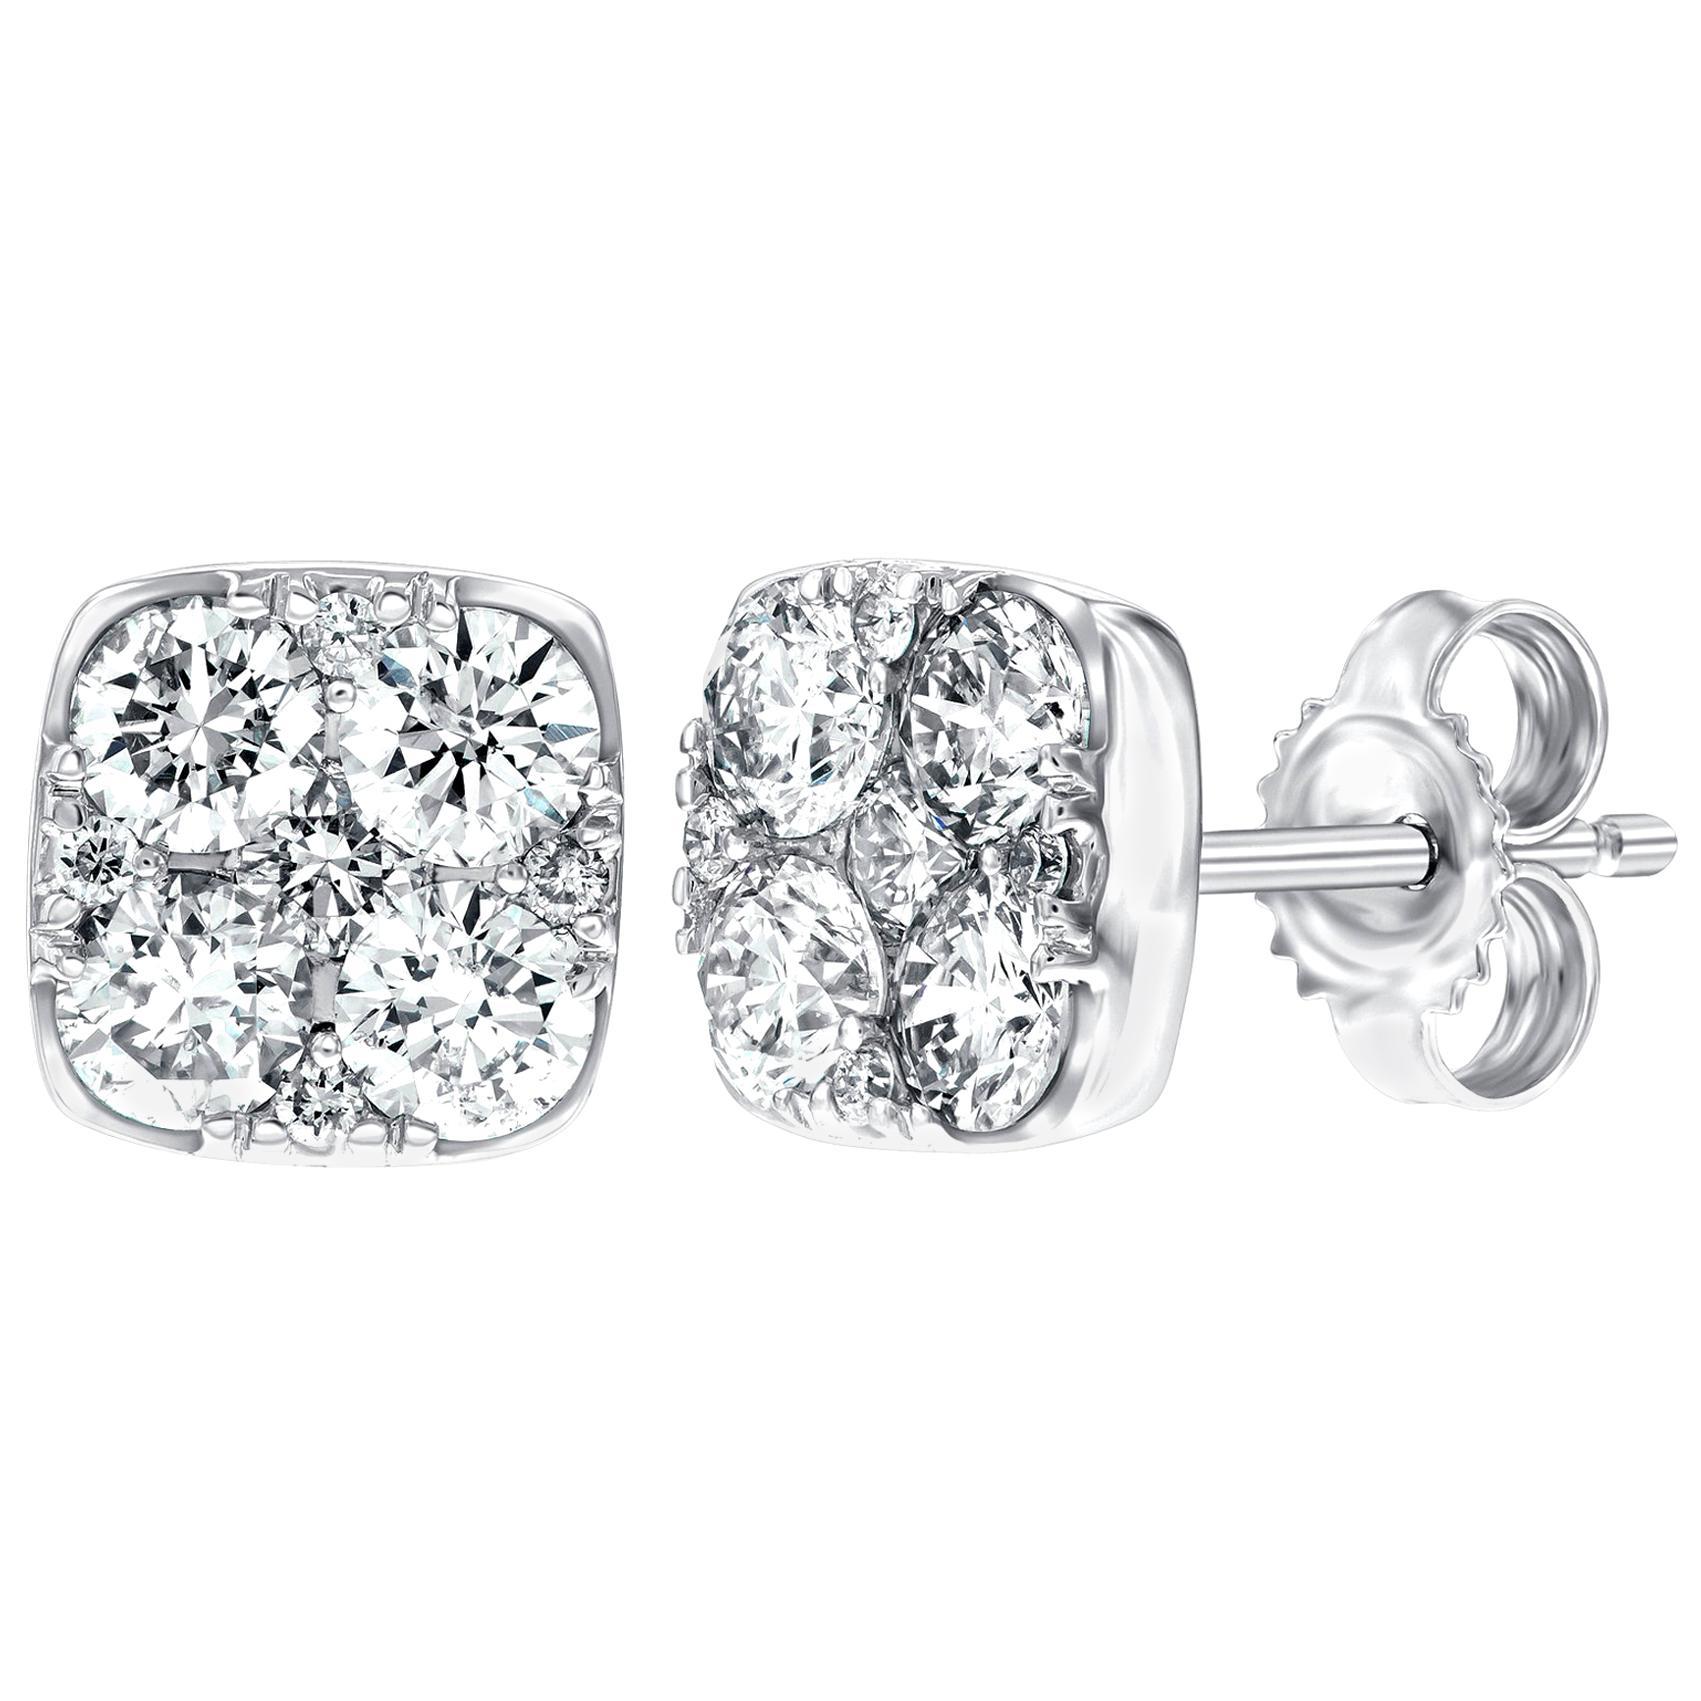 1.00 Carat Pave Set Round White Diamond Square 18 Karat White Gold Stud Earrings